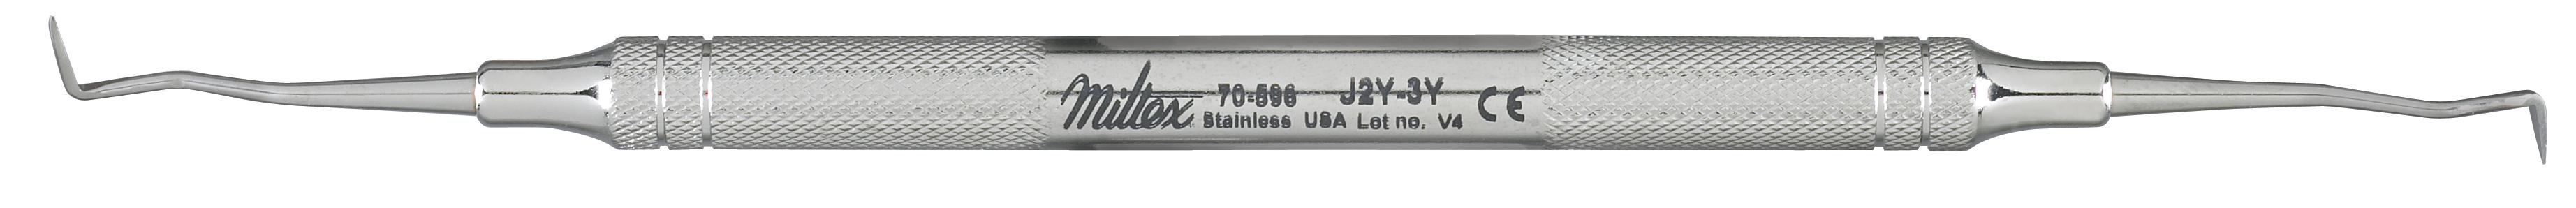 2y-3y-jacquette-scaler-d-e-lightweight-handle-70-596-miltex.jpg